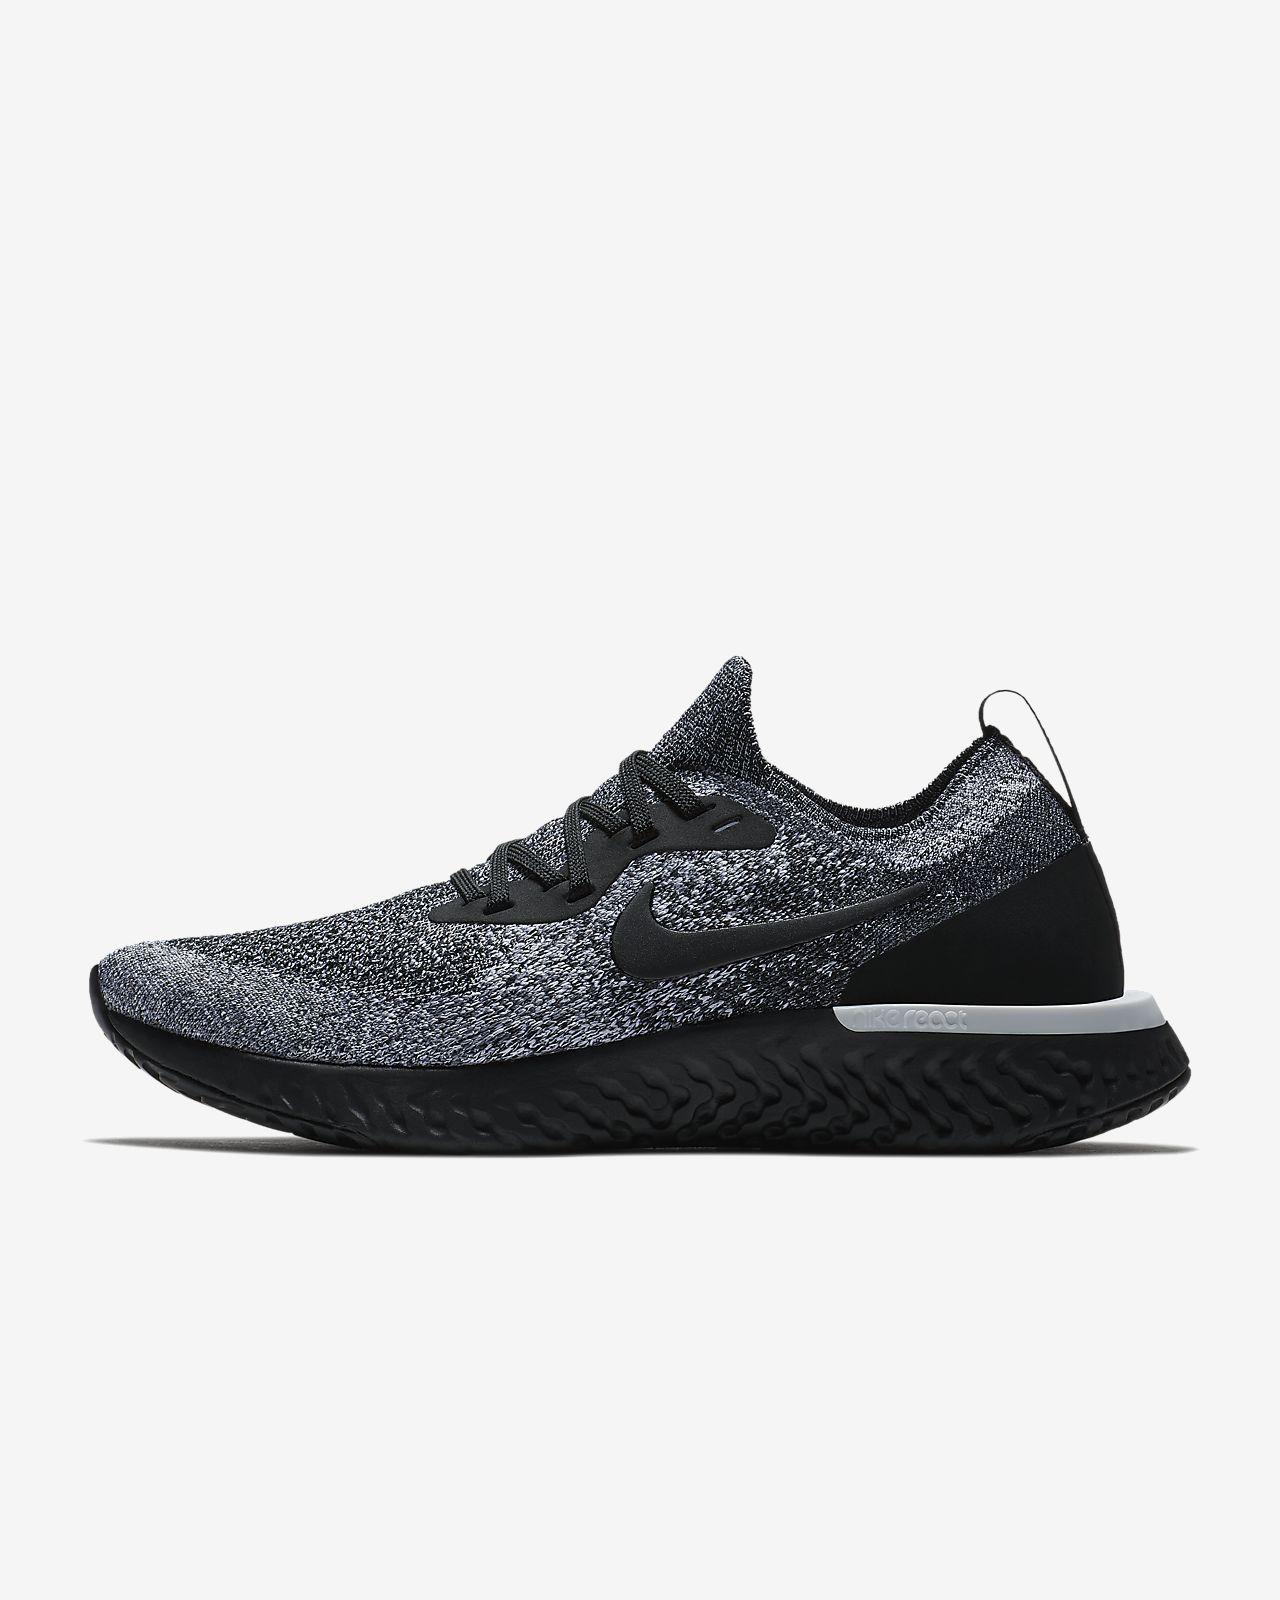 dd3dd7567f931 Nike Epic React Flyknit 1 Women s Running Shoe. Nike.com